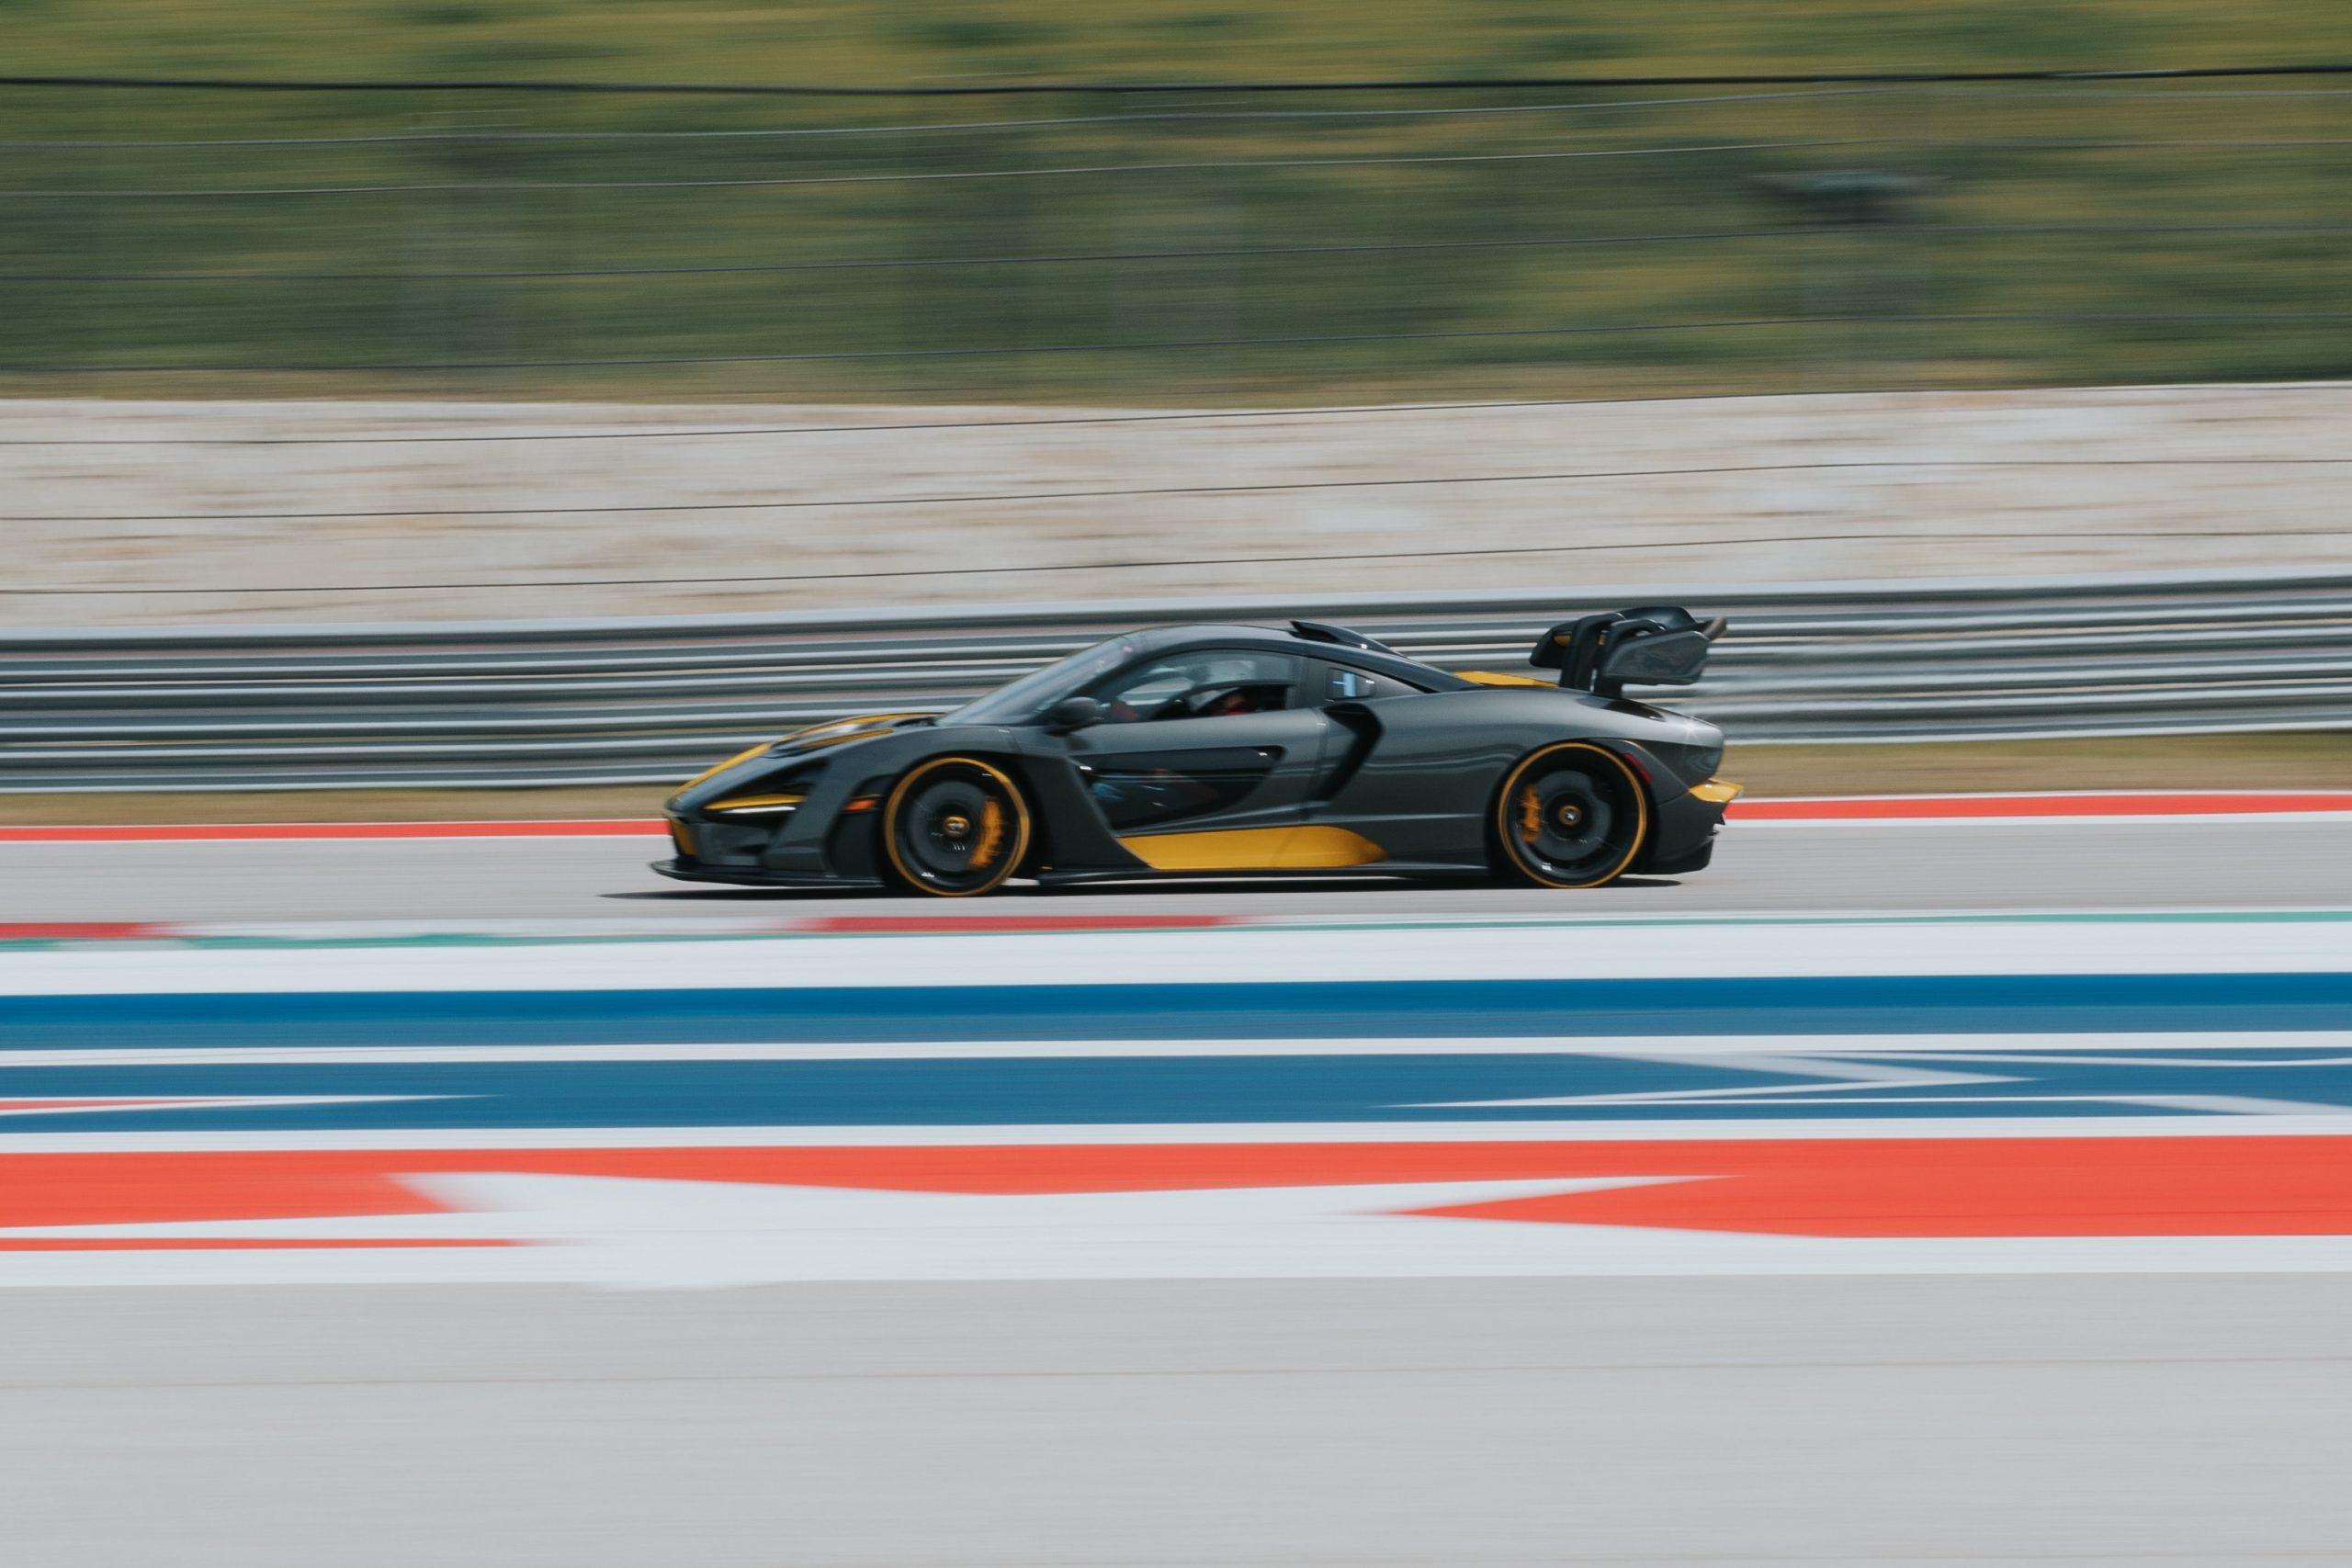 fast car speeding around a track